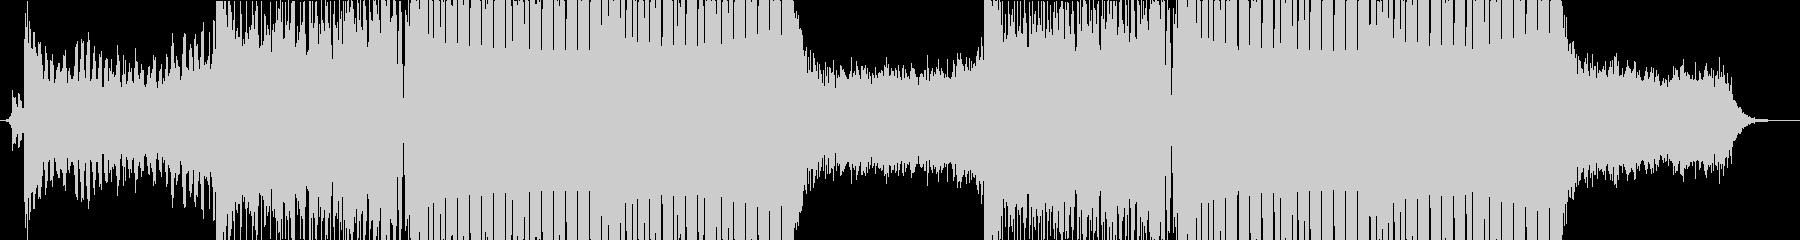 drop candy /エレクトロハウスの未再生の波形